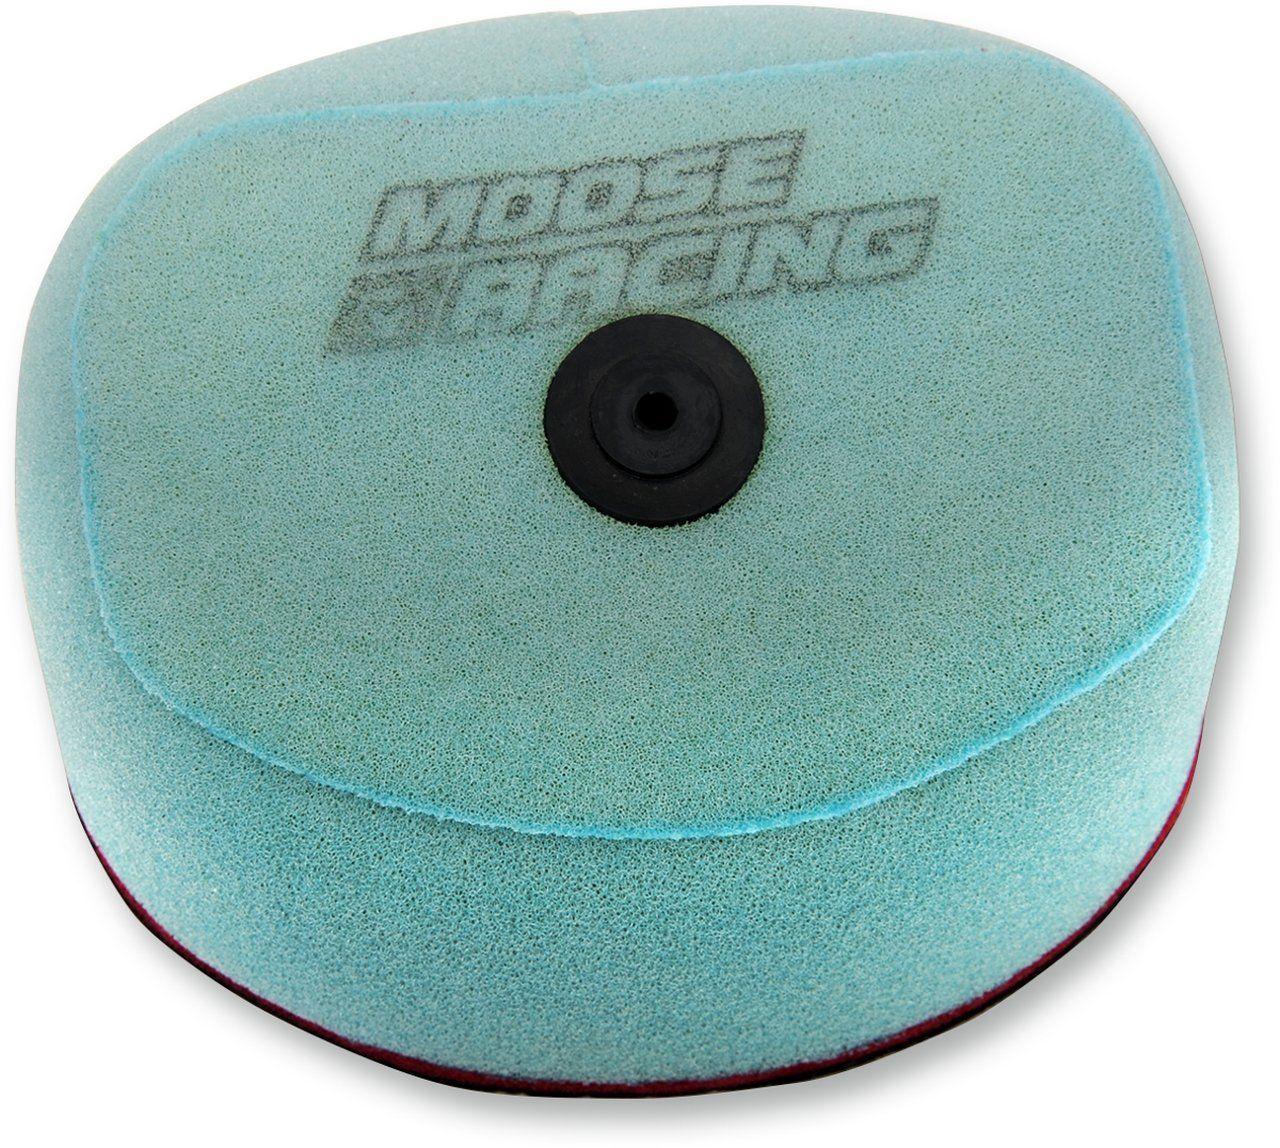 【MOOSE RACING】PRECISION PRE-OILED 空氣濾芯 [1011-3923] - 「Webike-摩托百貨」